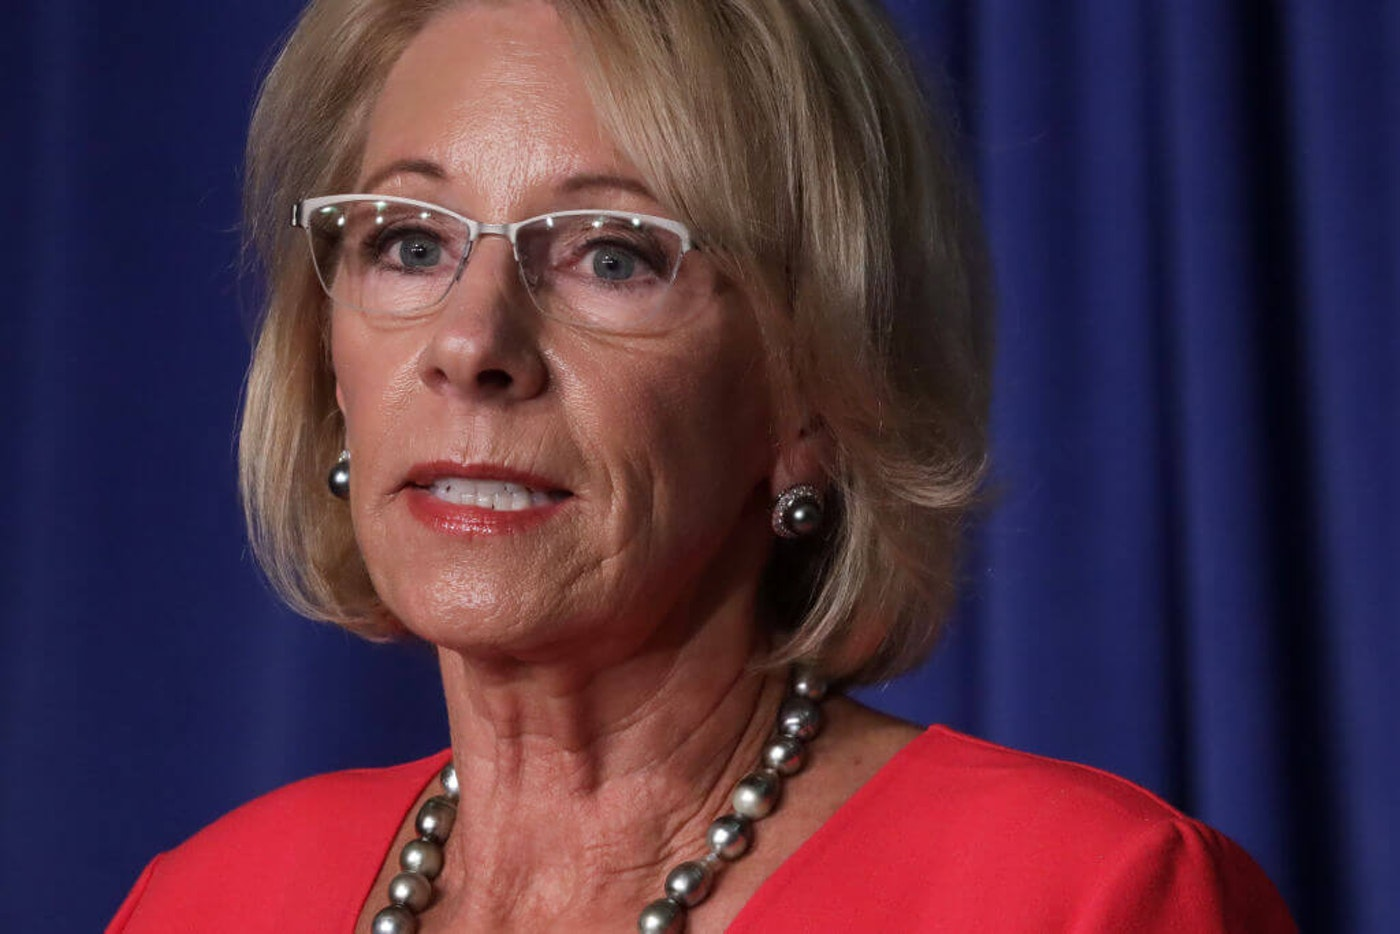 U.S. Secretary of Education Betsy DeVos (Photo by Alex Wong/Getty Images)